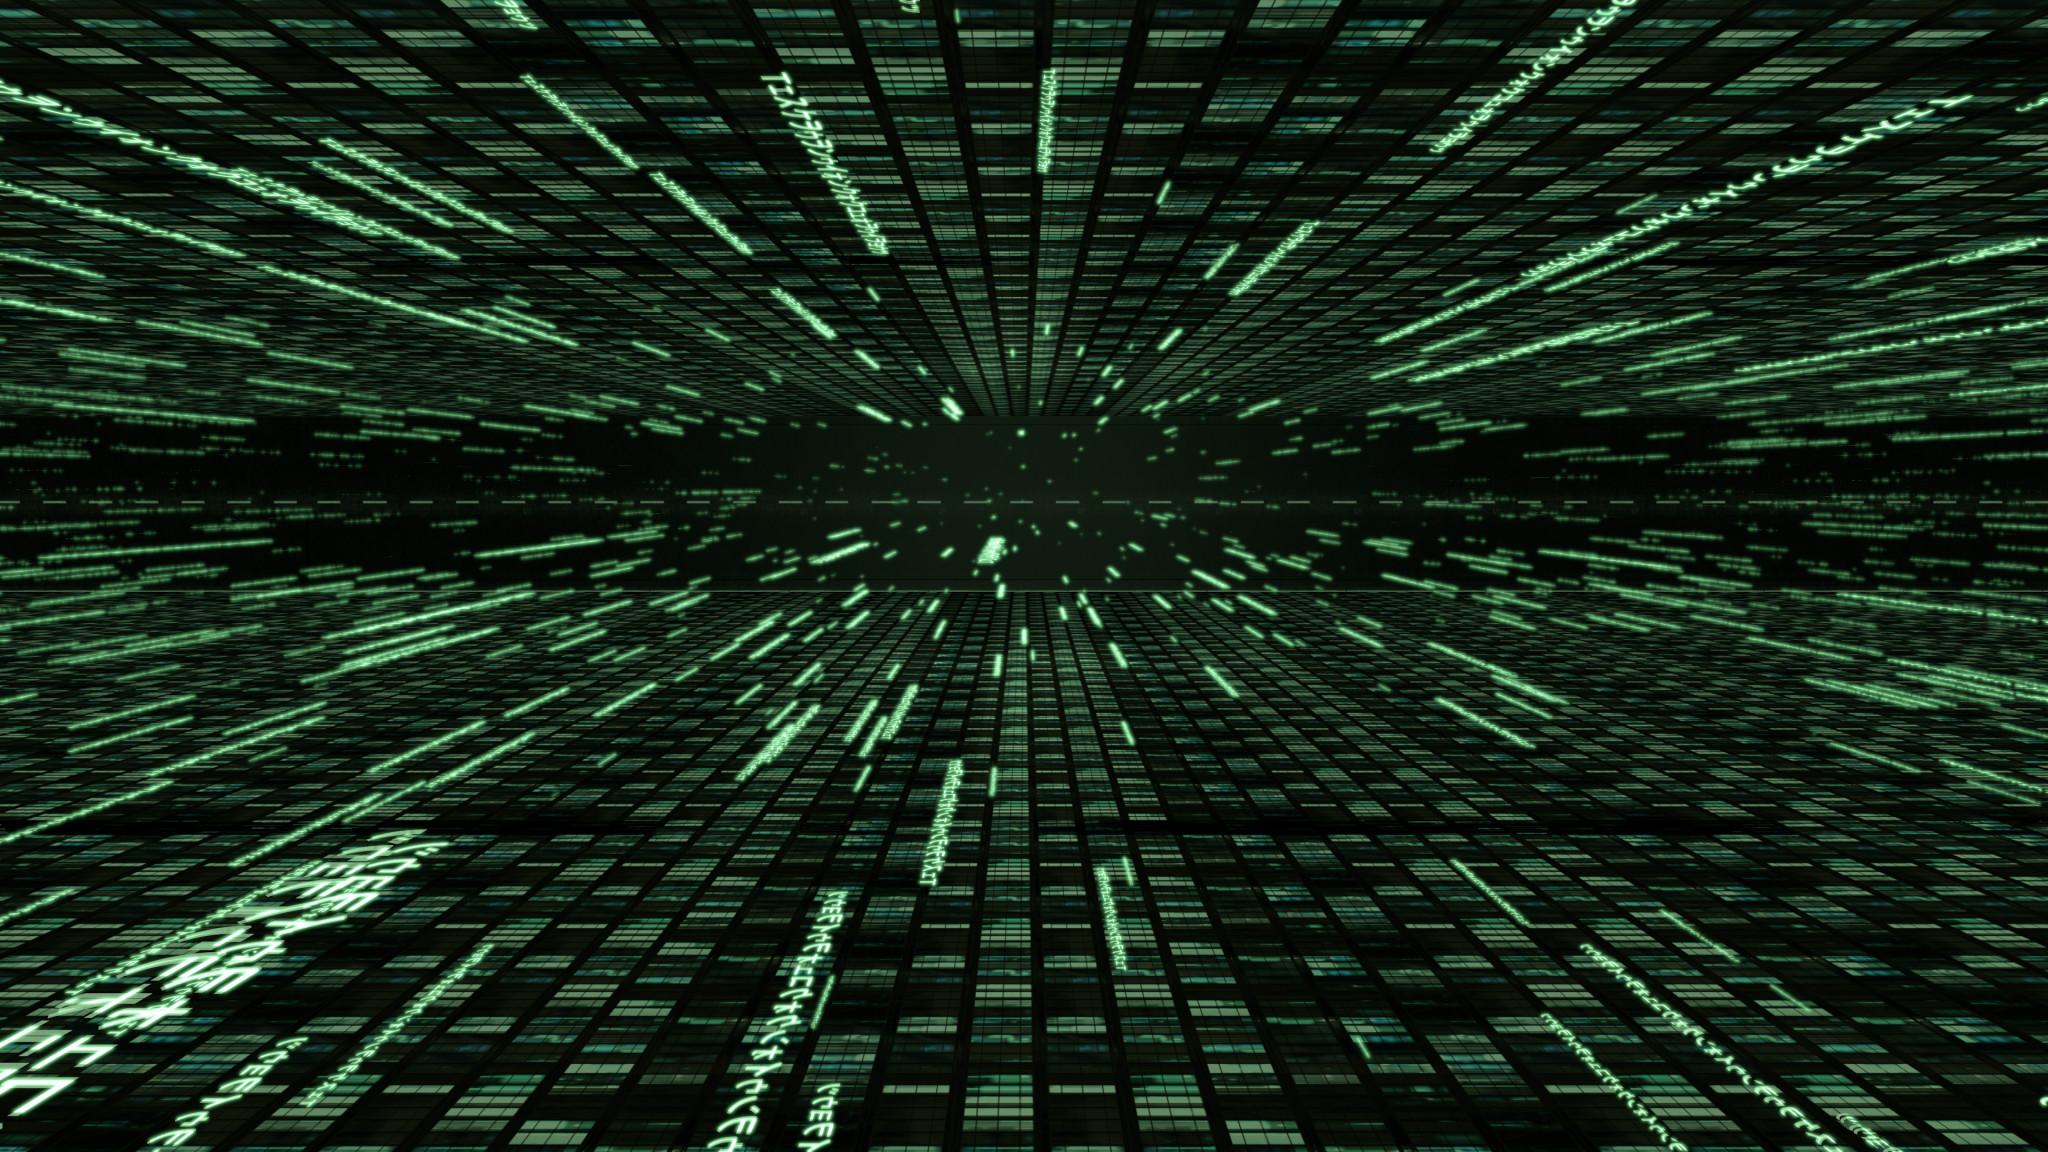 matrix macbook wallpapers hd